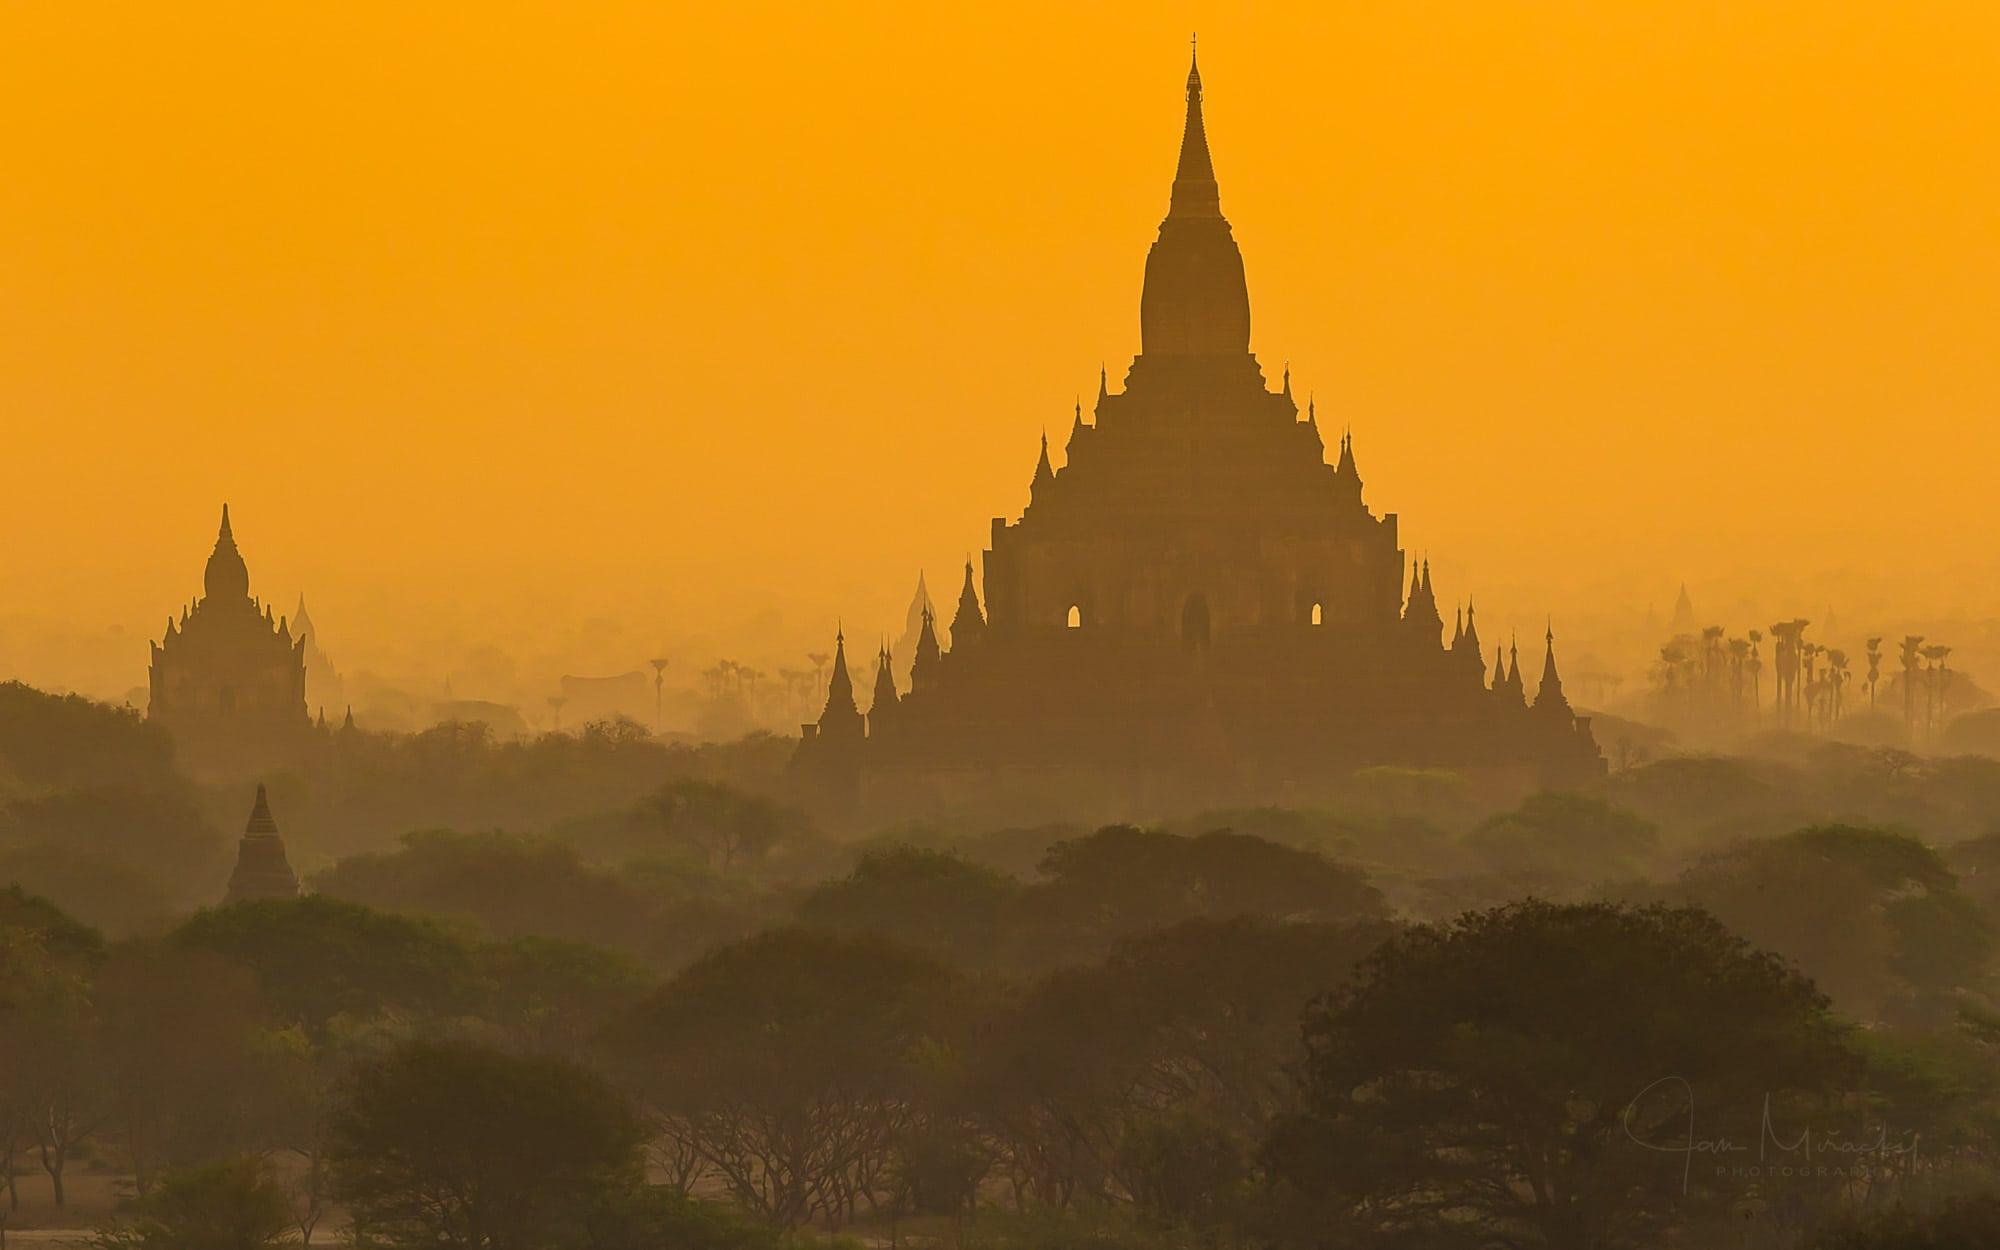 Beautiful atmosphere during sunrise in Bagan